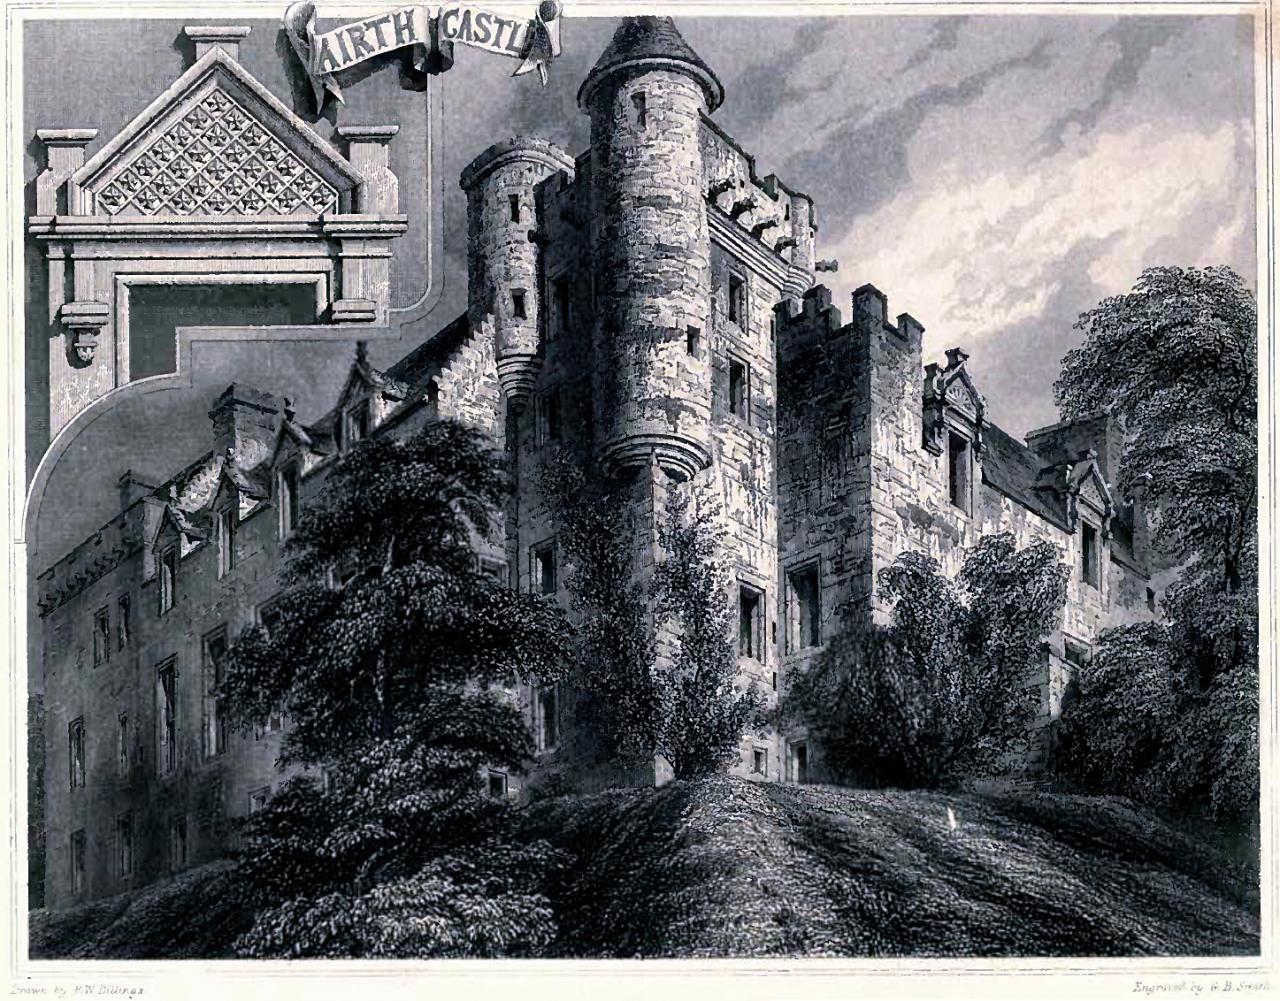 Airth-Castle